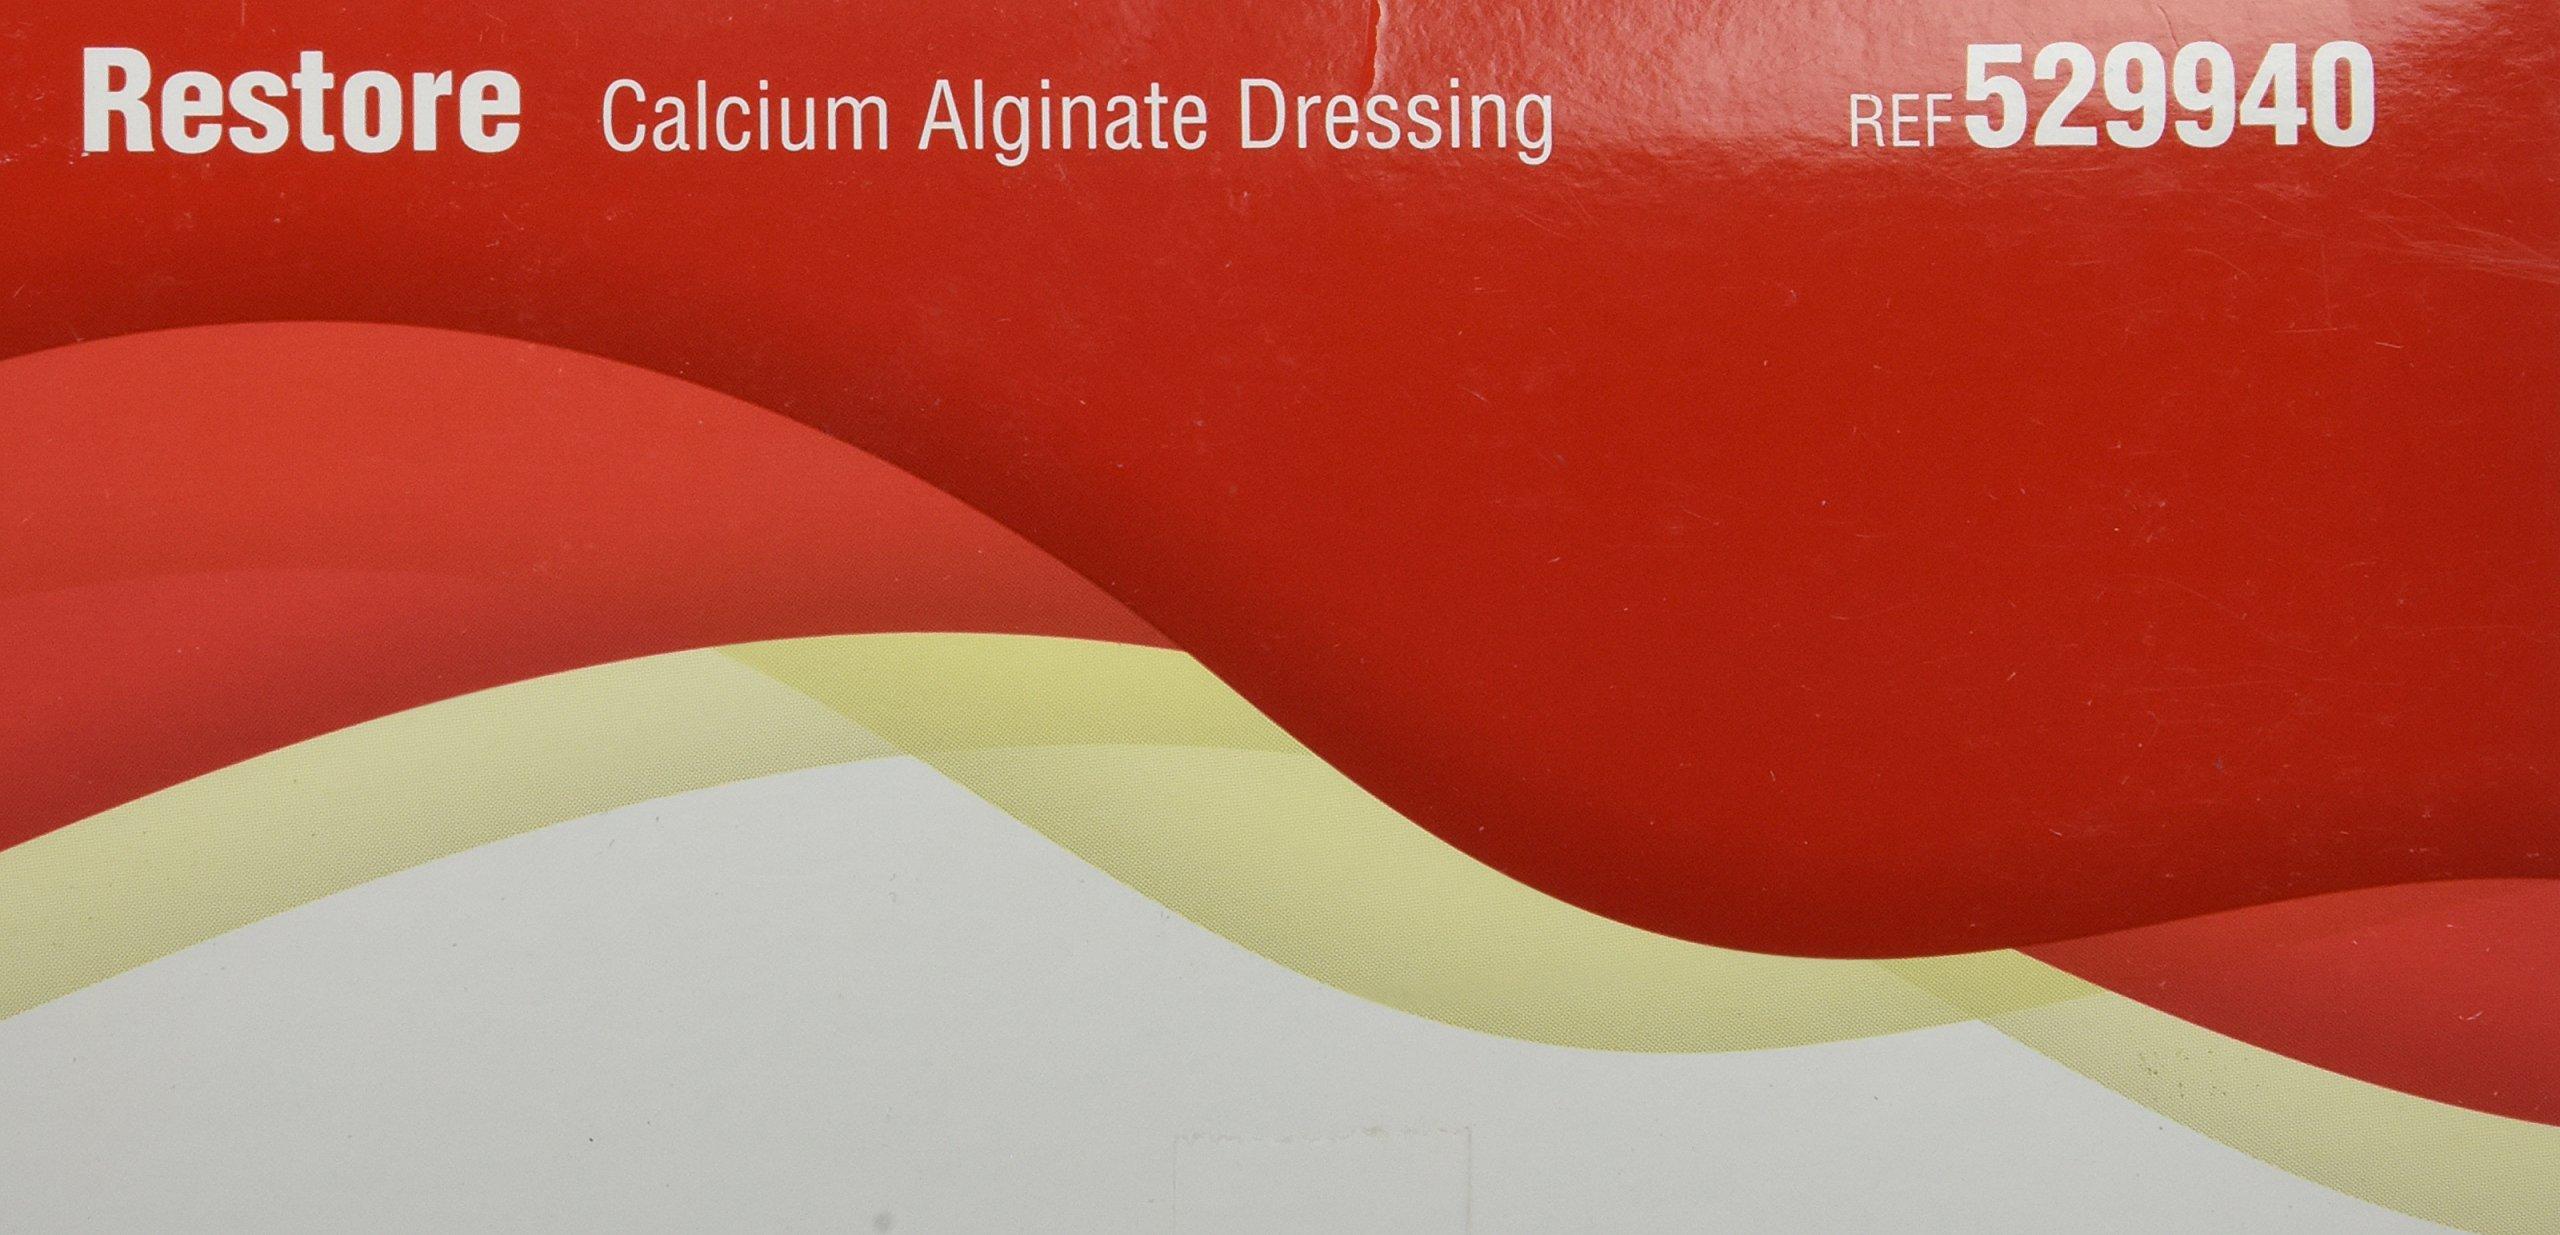 "Hollister Restore Calcium Alginate Dressing - 12"" Rope Box of 5 - Hol529940_Bx"